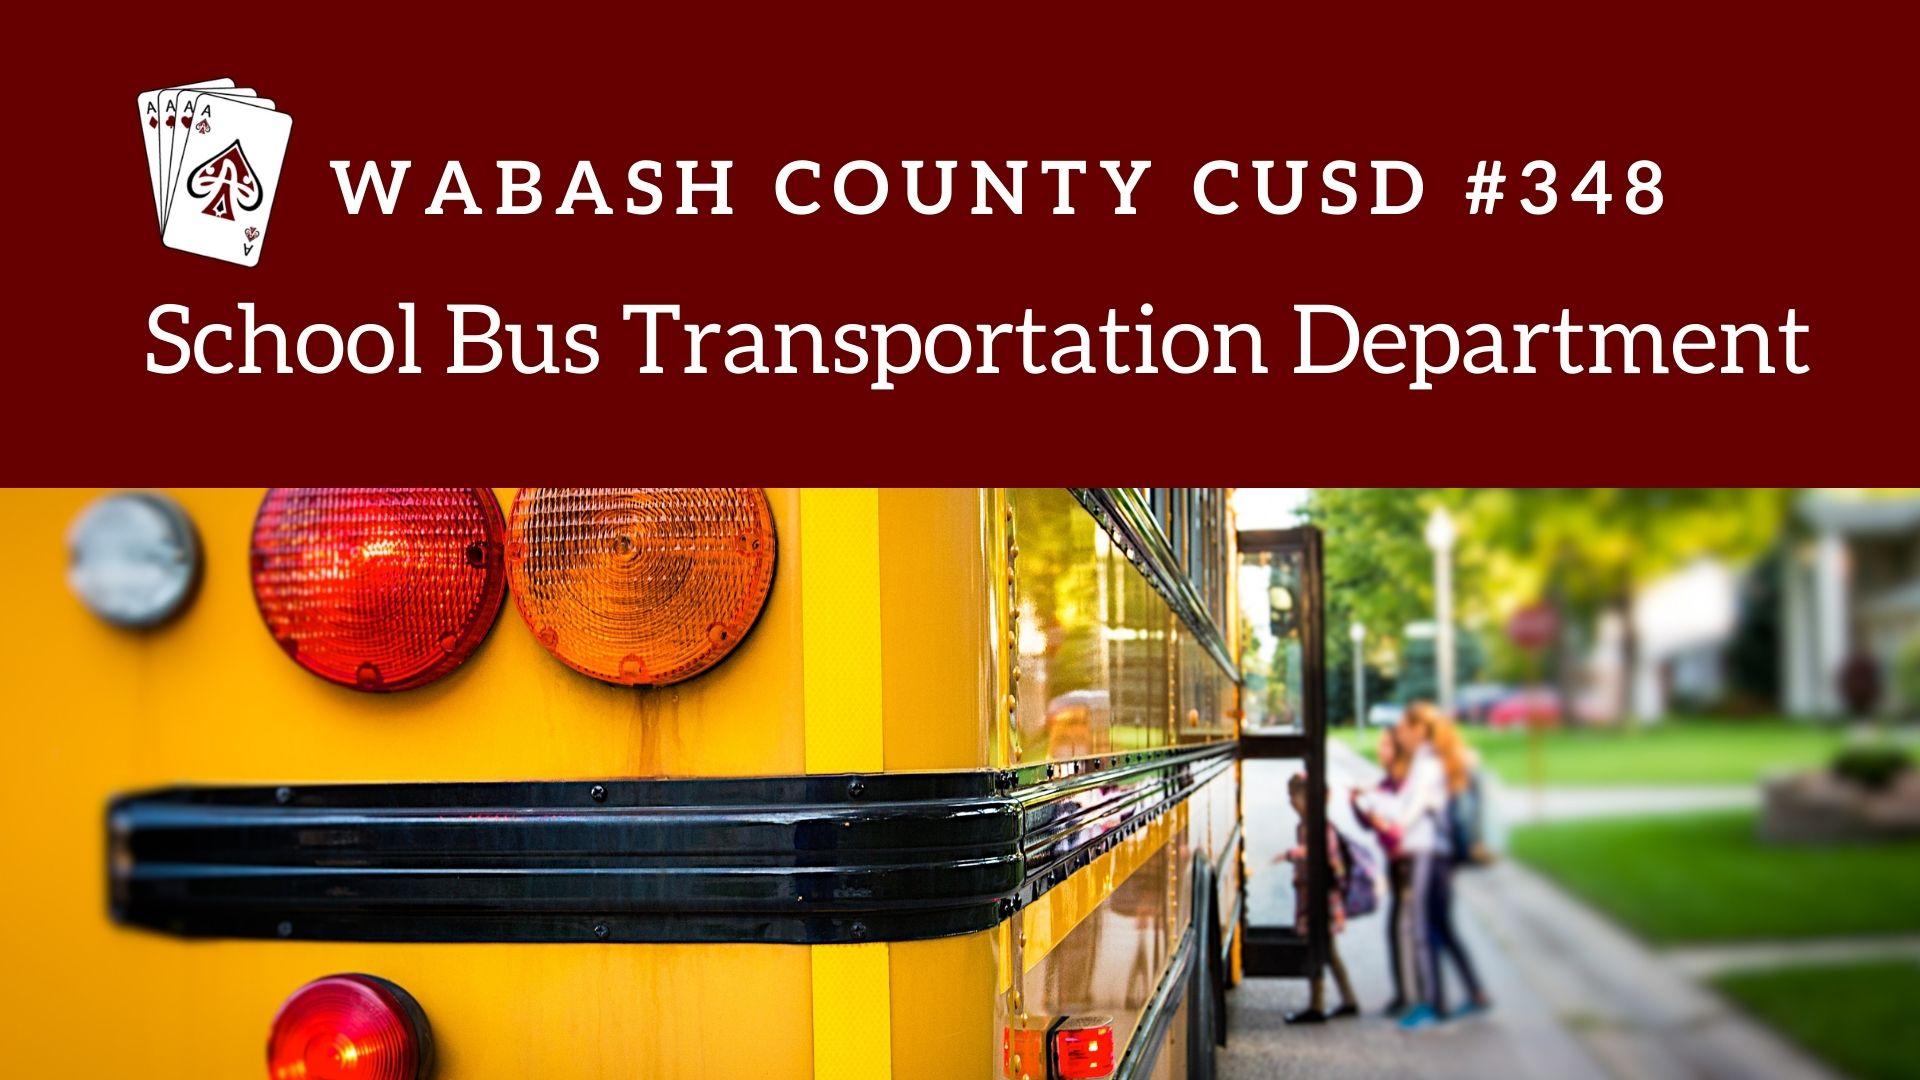 School Bus Transportation Department